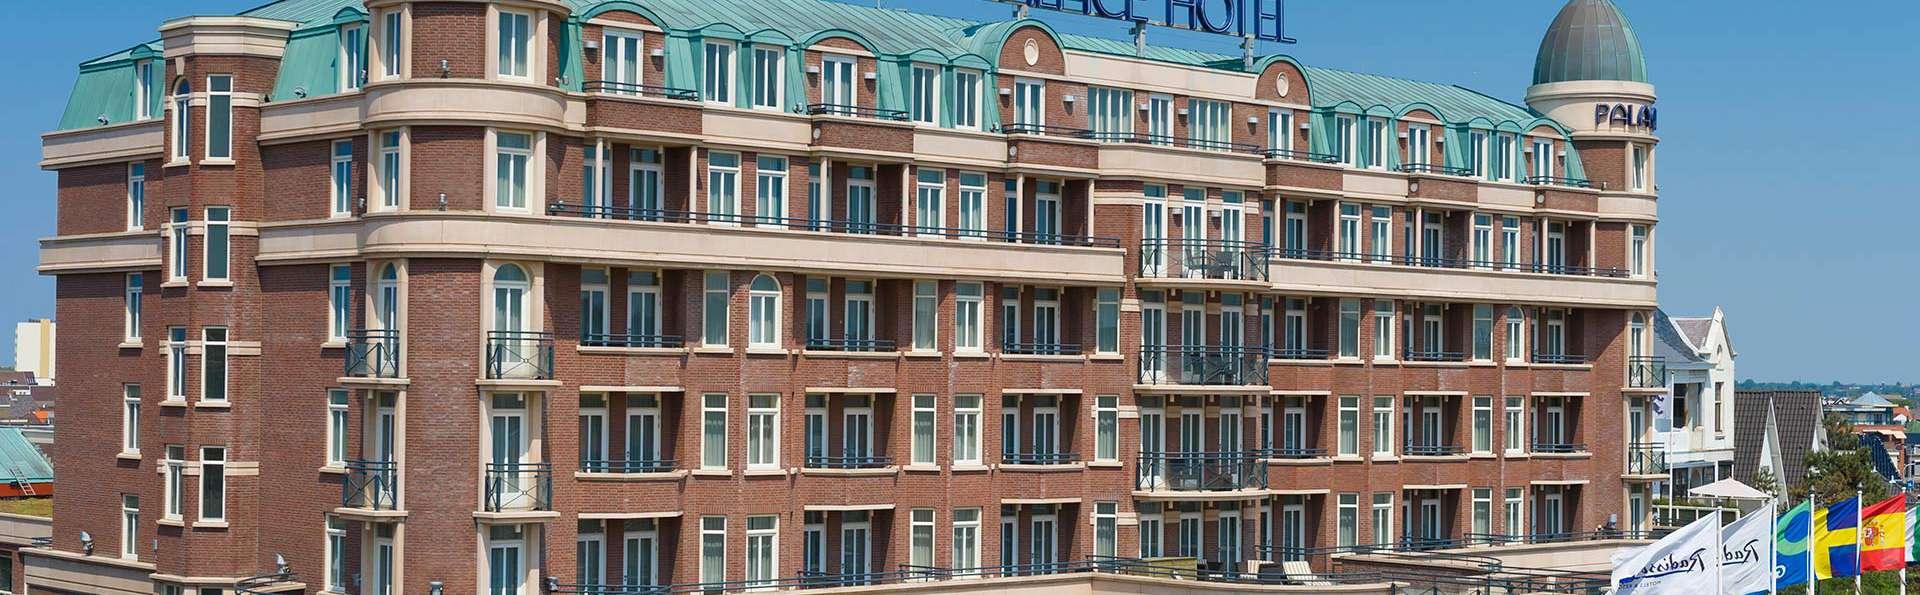 Radisson Blu Palace Hotel Noordwijk - EDIT_front1.jpg